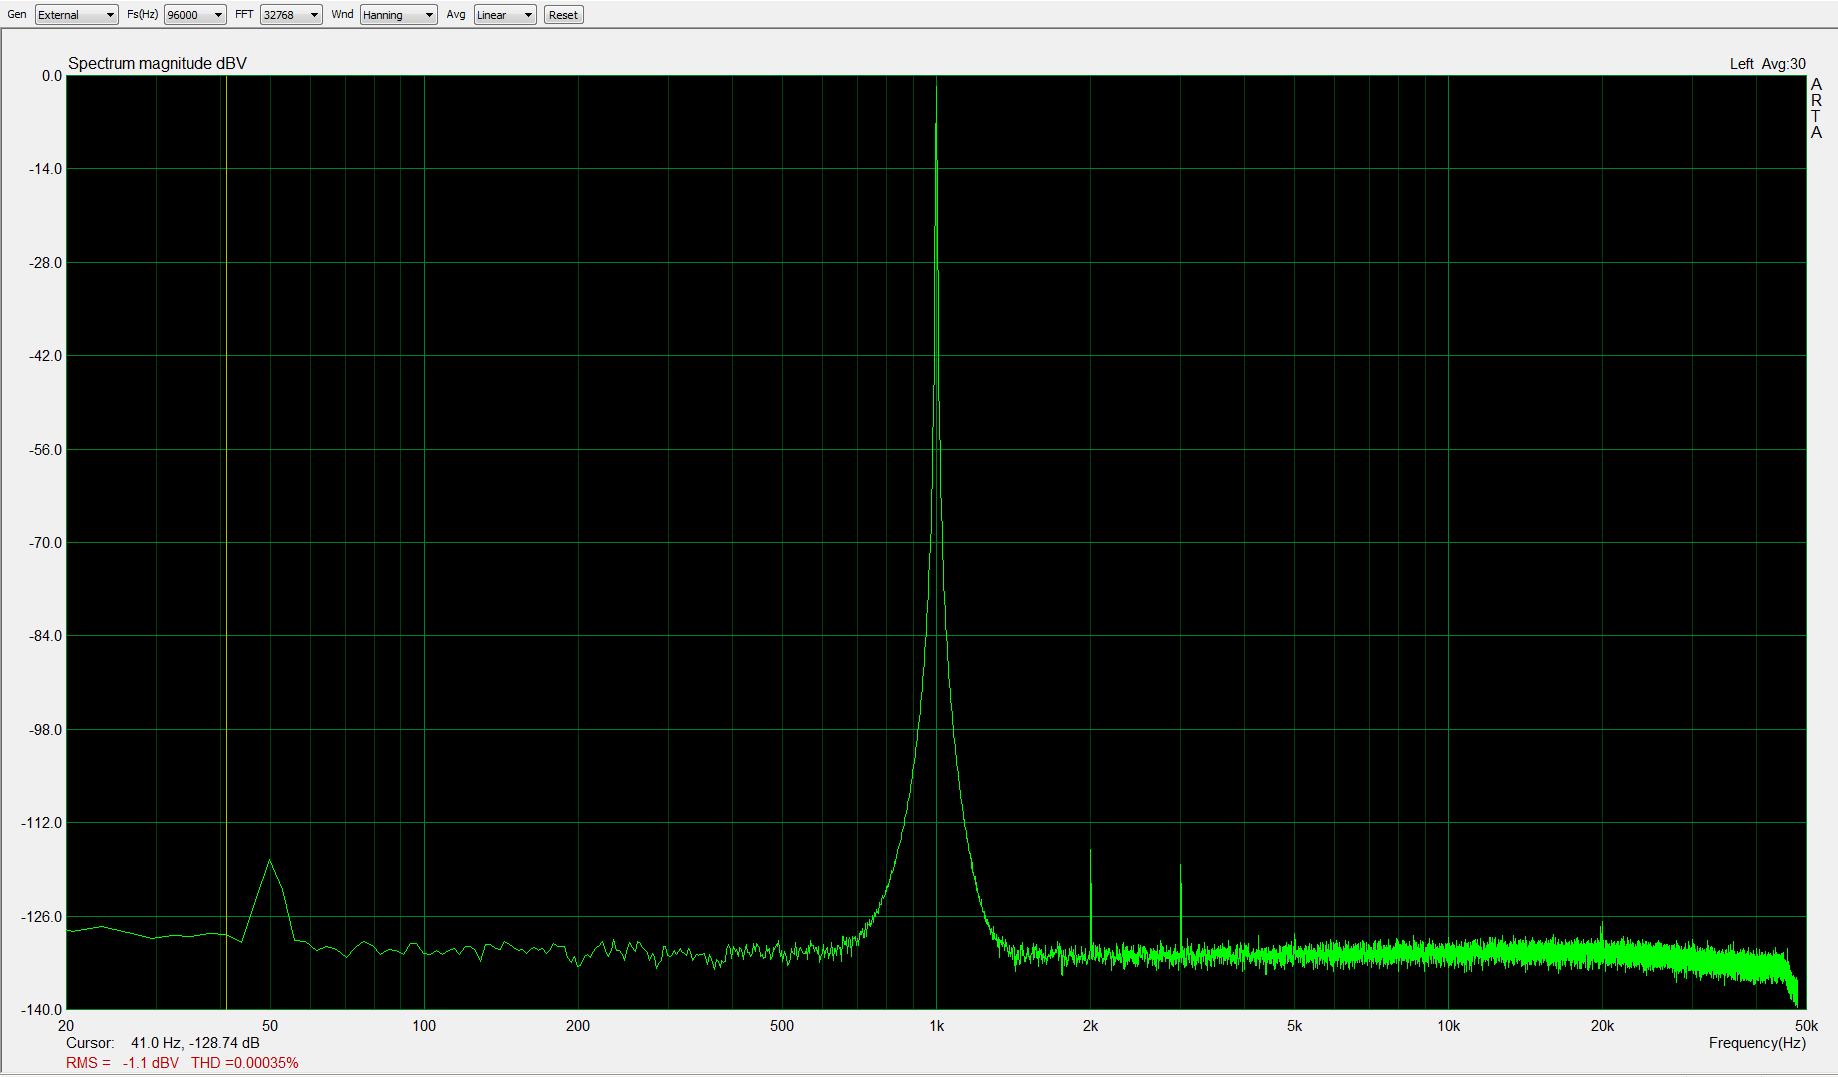 1kHz, -1dBFS, fs=96kHzV; THD < 0,0004%